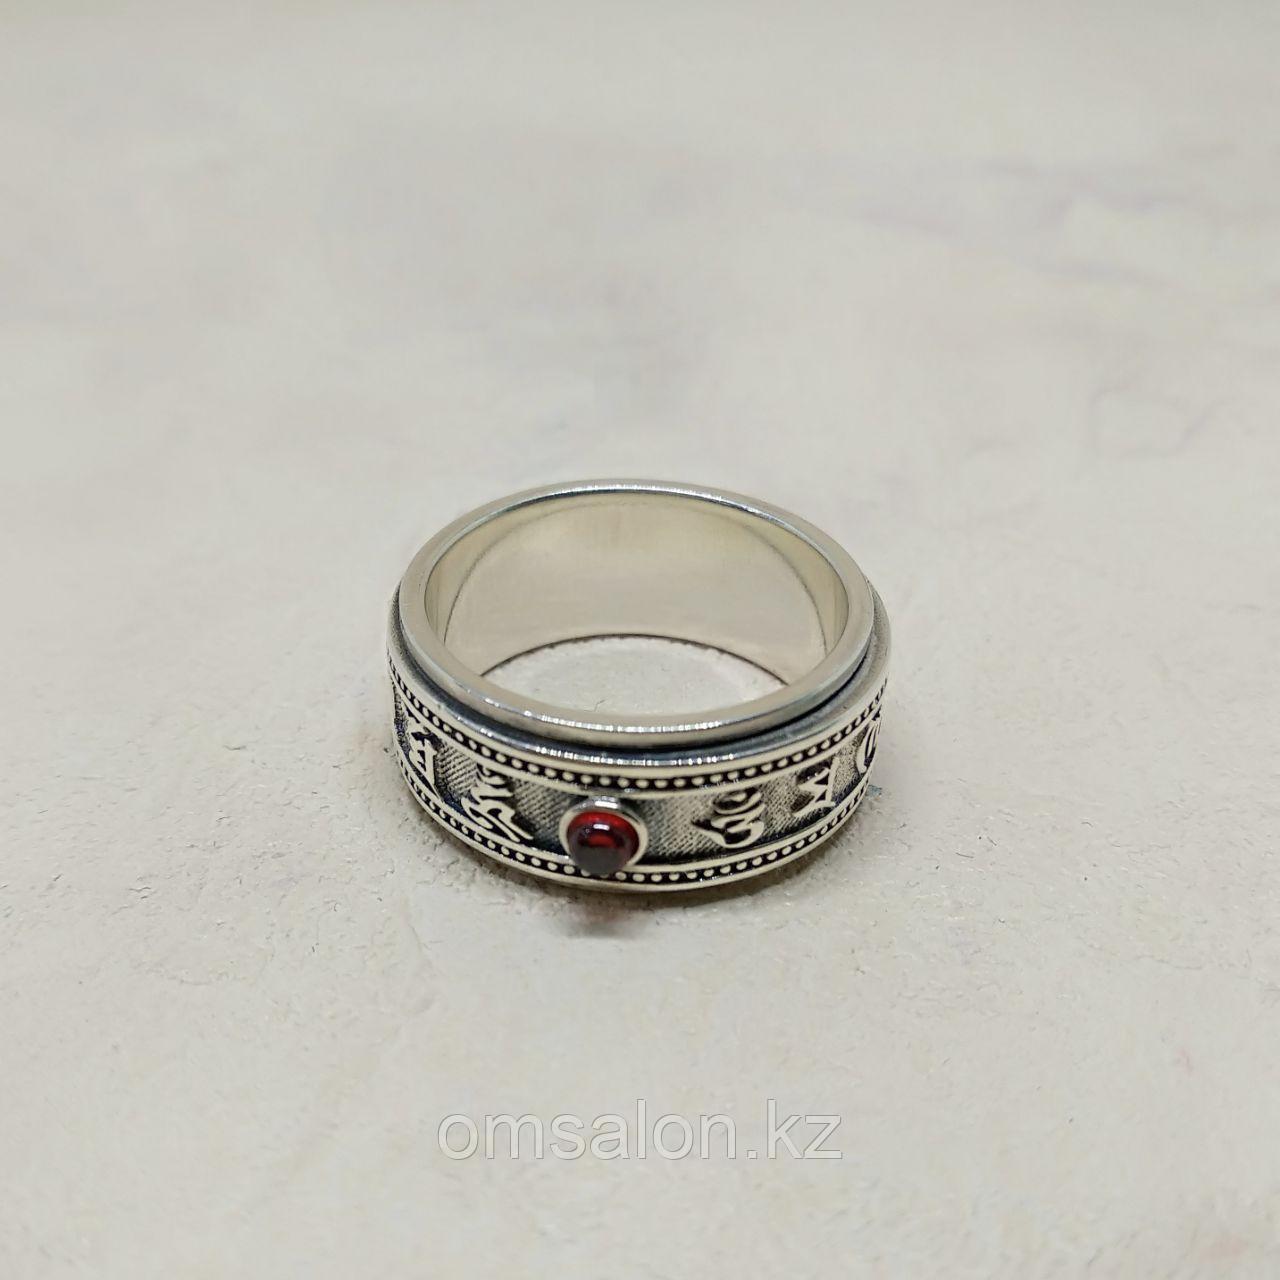 Кольцо Ом Мани Падме Хум, двойное, серебро 925